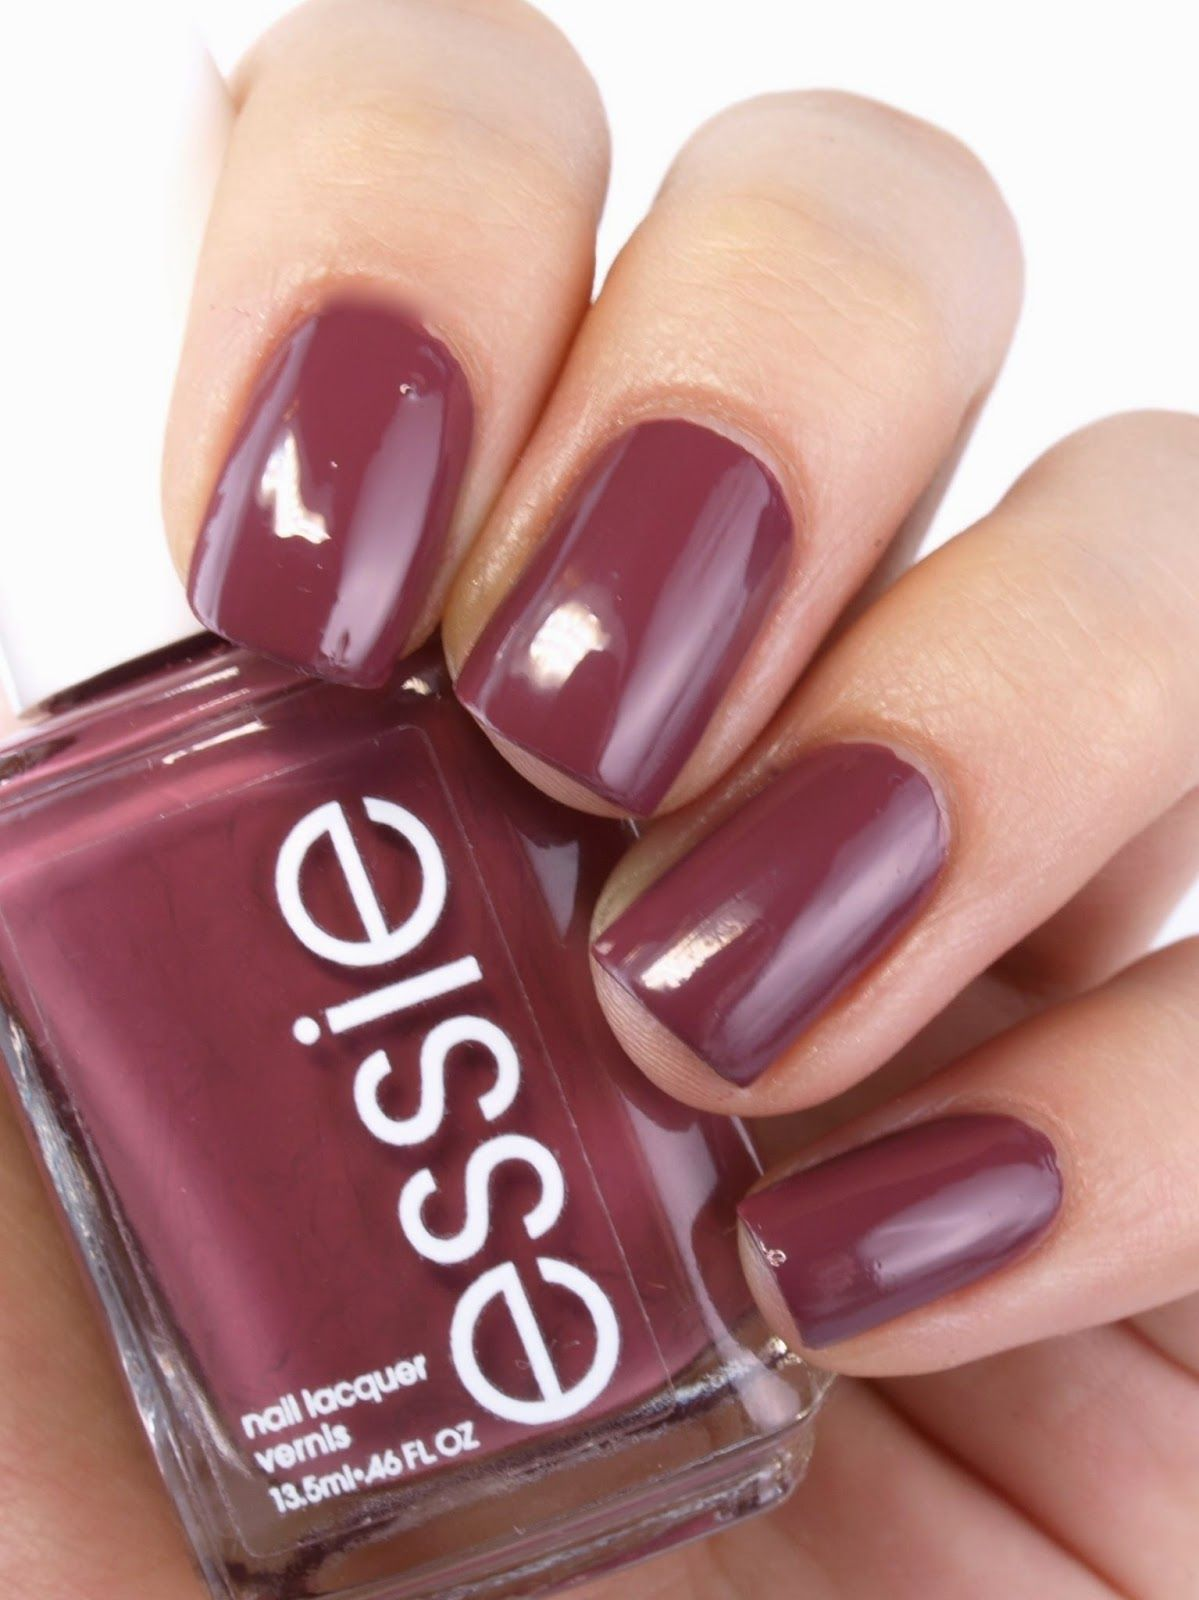 Pantone Color of the Year 2015: All Things Marsala | Nails: Polish ...